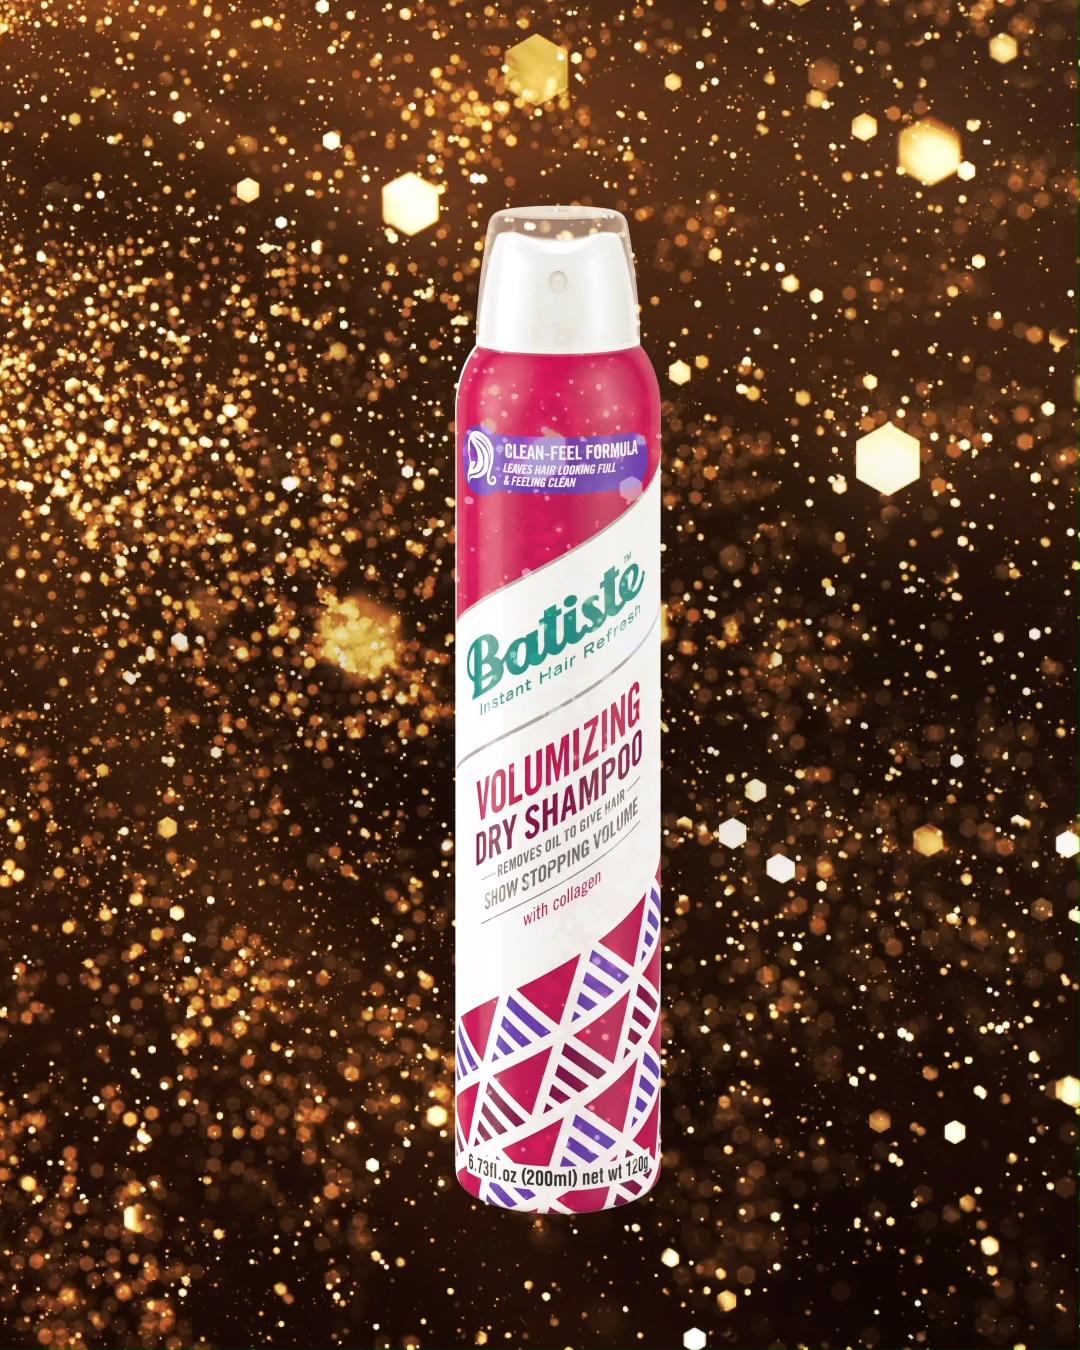 New Batiste Volumizing Dry Shampoo Refresh Feel The Power Of Big Beautiful Hair Video Batiste Dry Shampoo Dry Shampoo Hair Tea